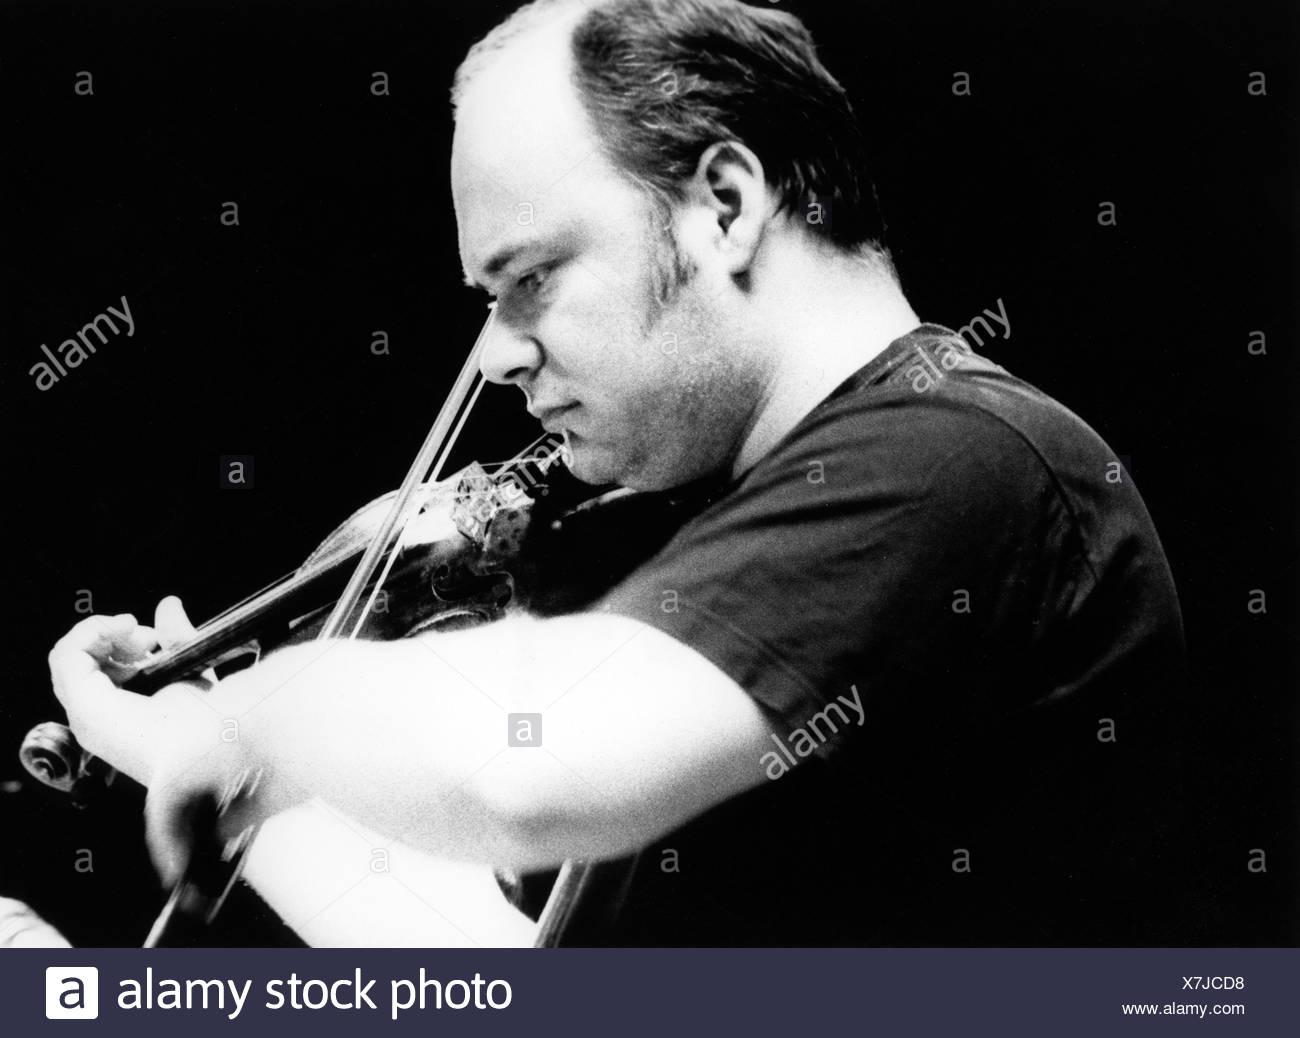 Balanescu, Alexander, Romanian musician (Jazz), half length, playing violin, live performance, Stuttgart 1995, Additional-Rights-Clearances-NA - Stock Image